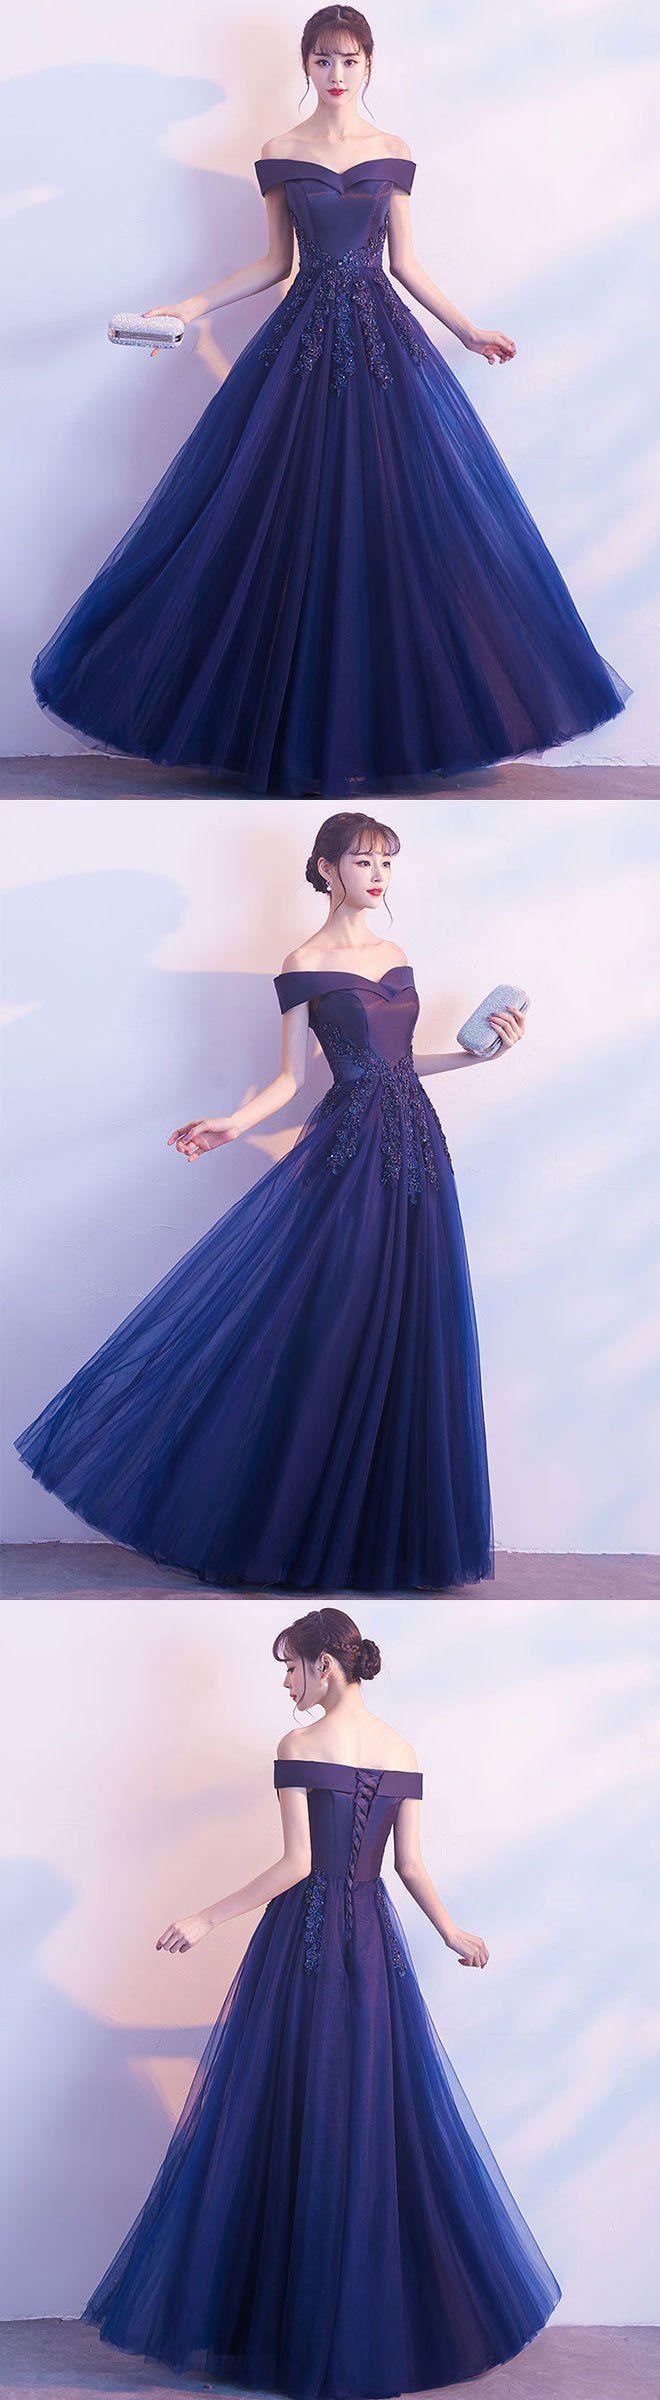 Dark blue off shoulder long prom dress blue evening dress blue